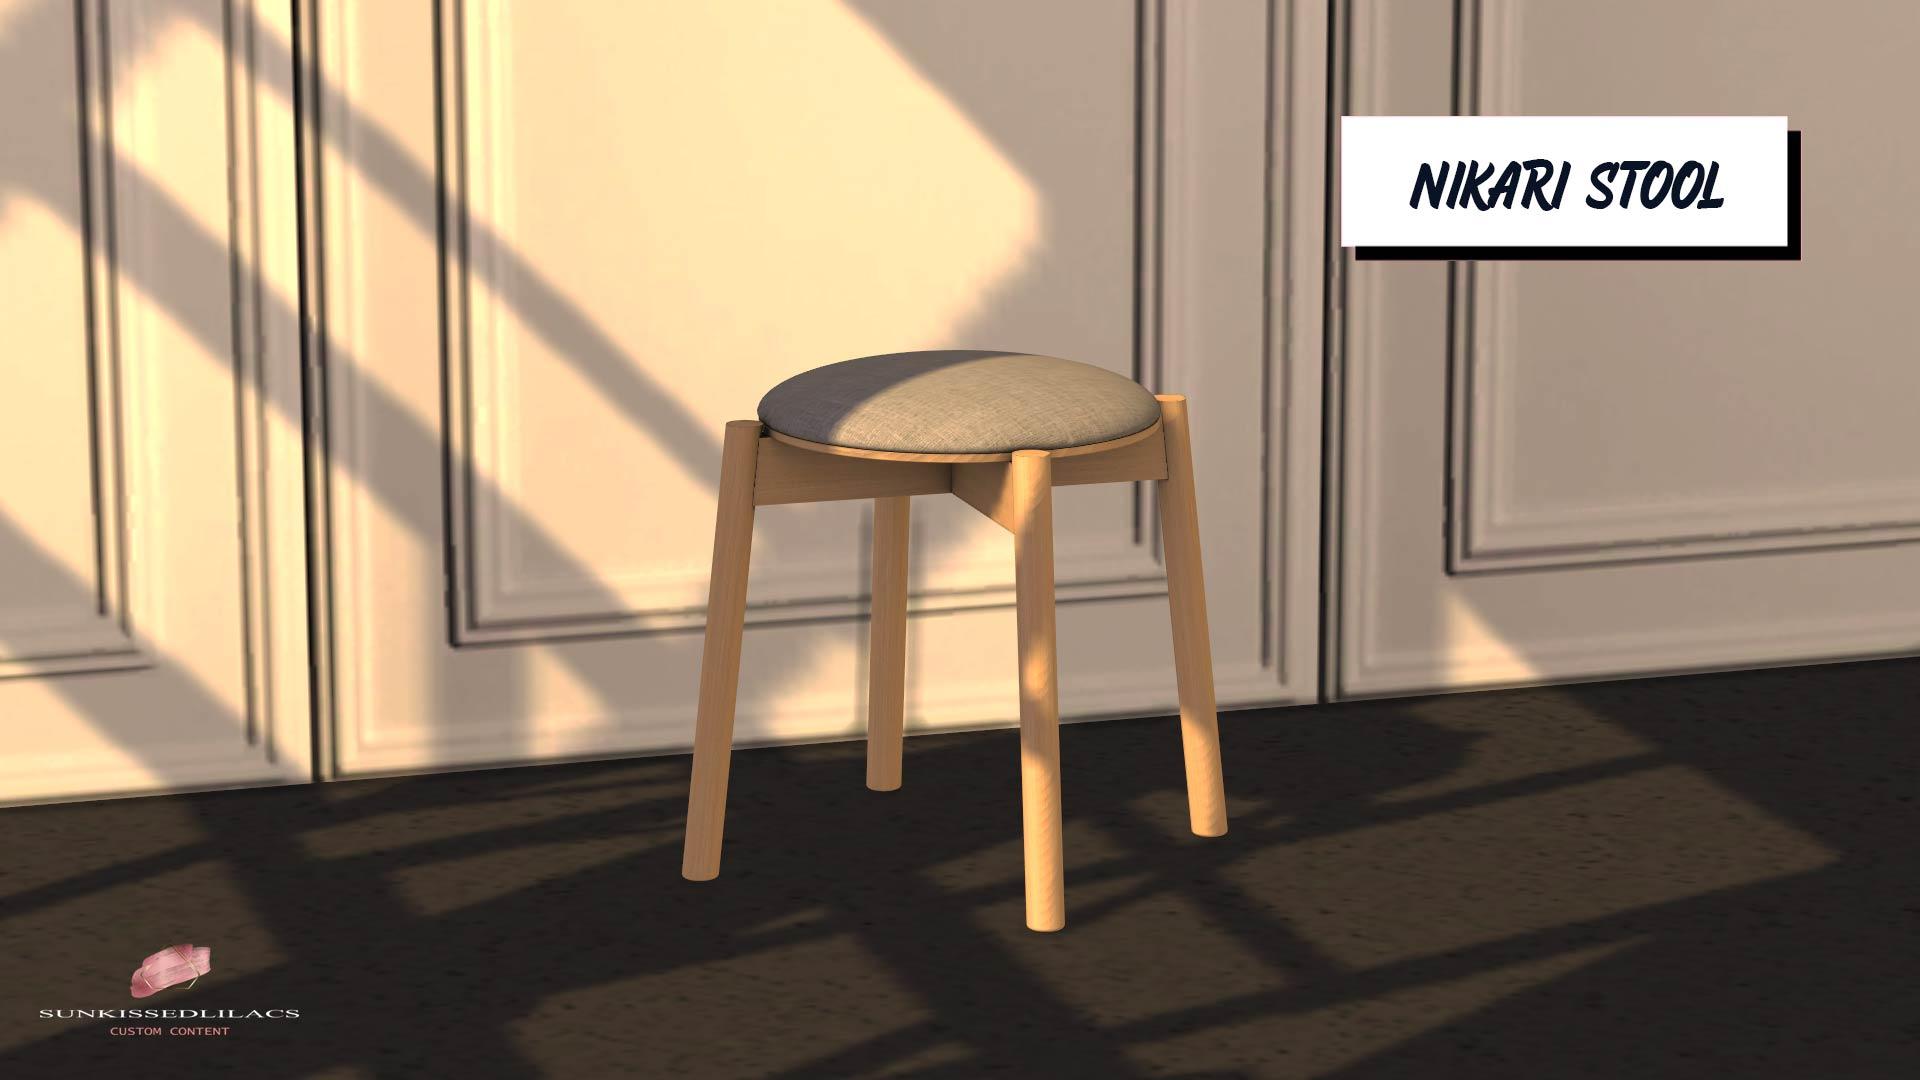 Nikari Stool, high quality sims 4 cc, sunkissedlilacs, free sims 4 furniture, sims 4 custom content,